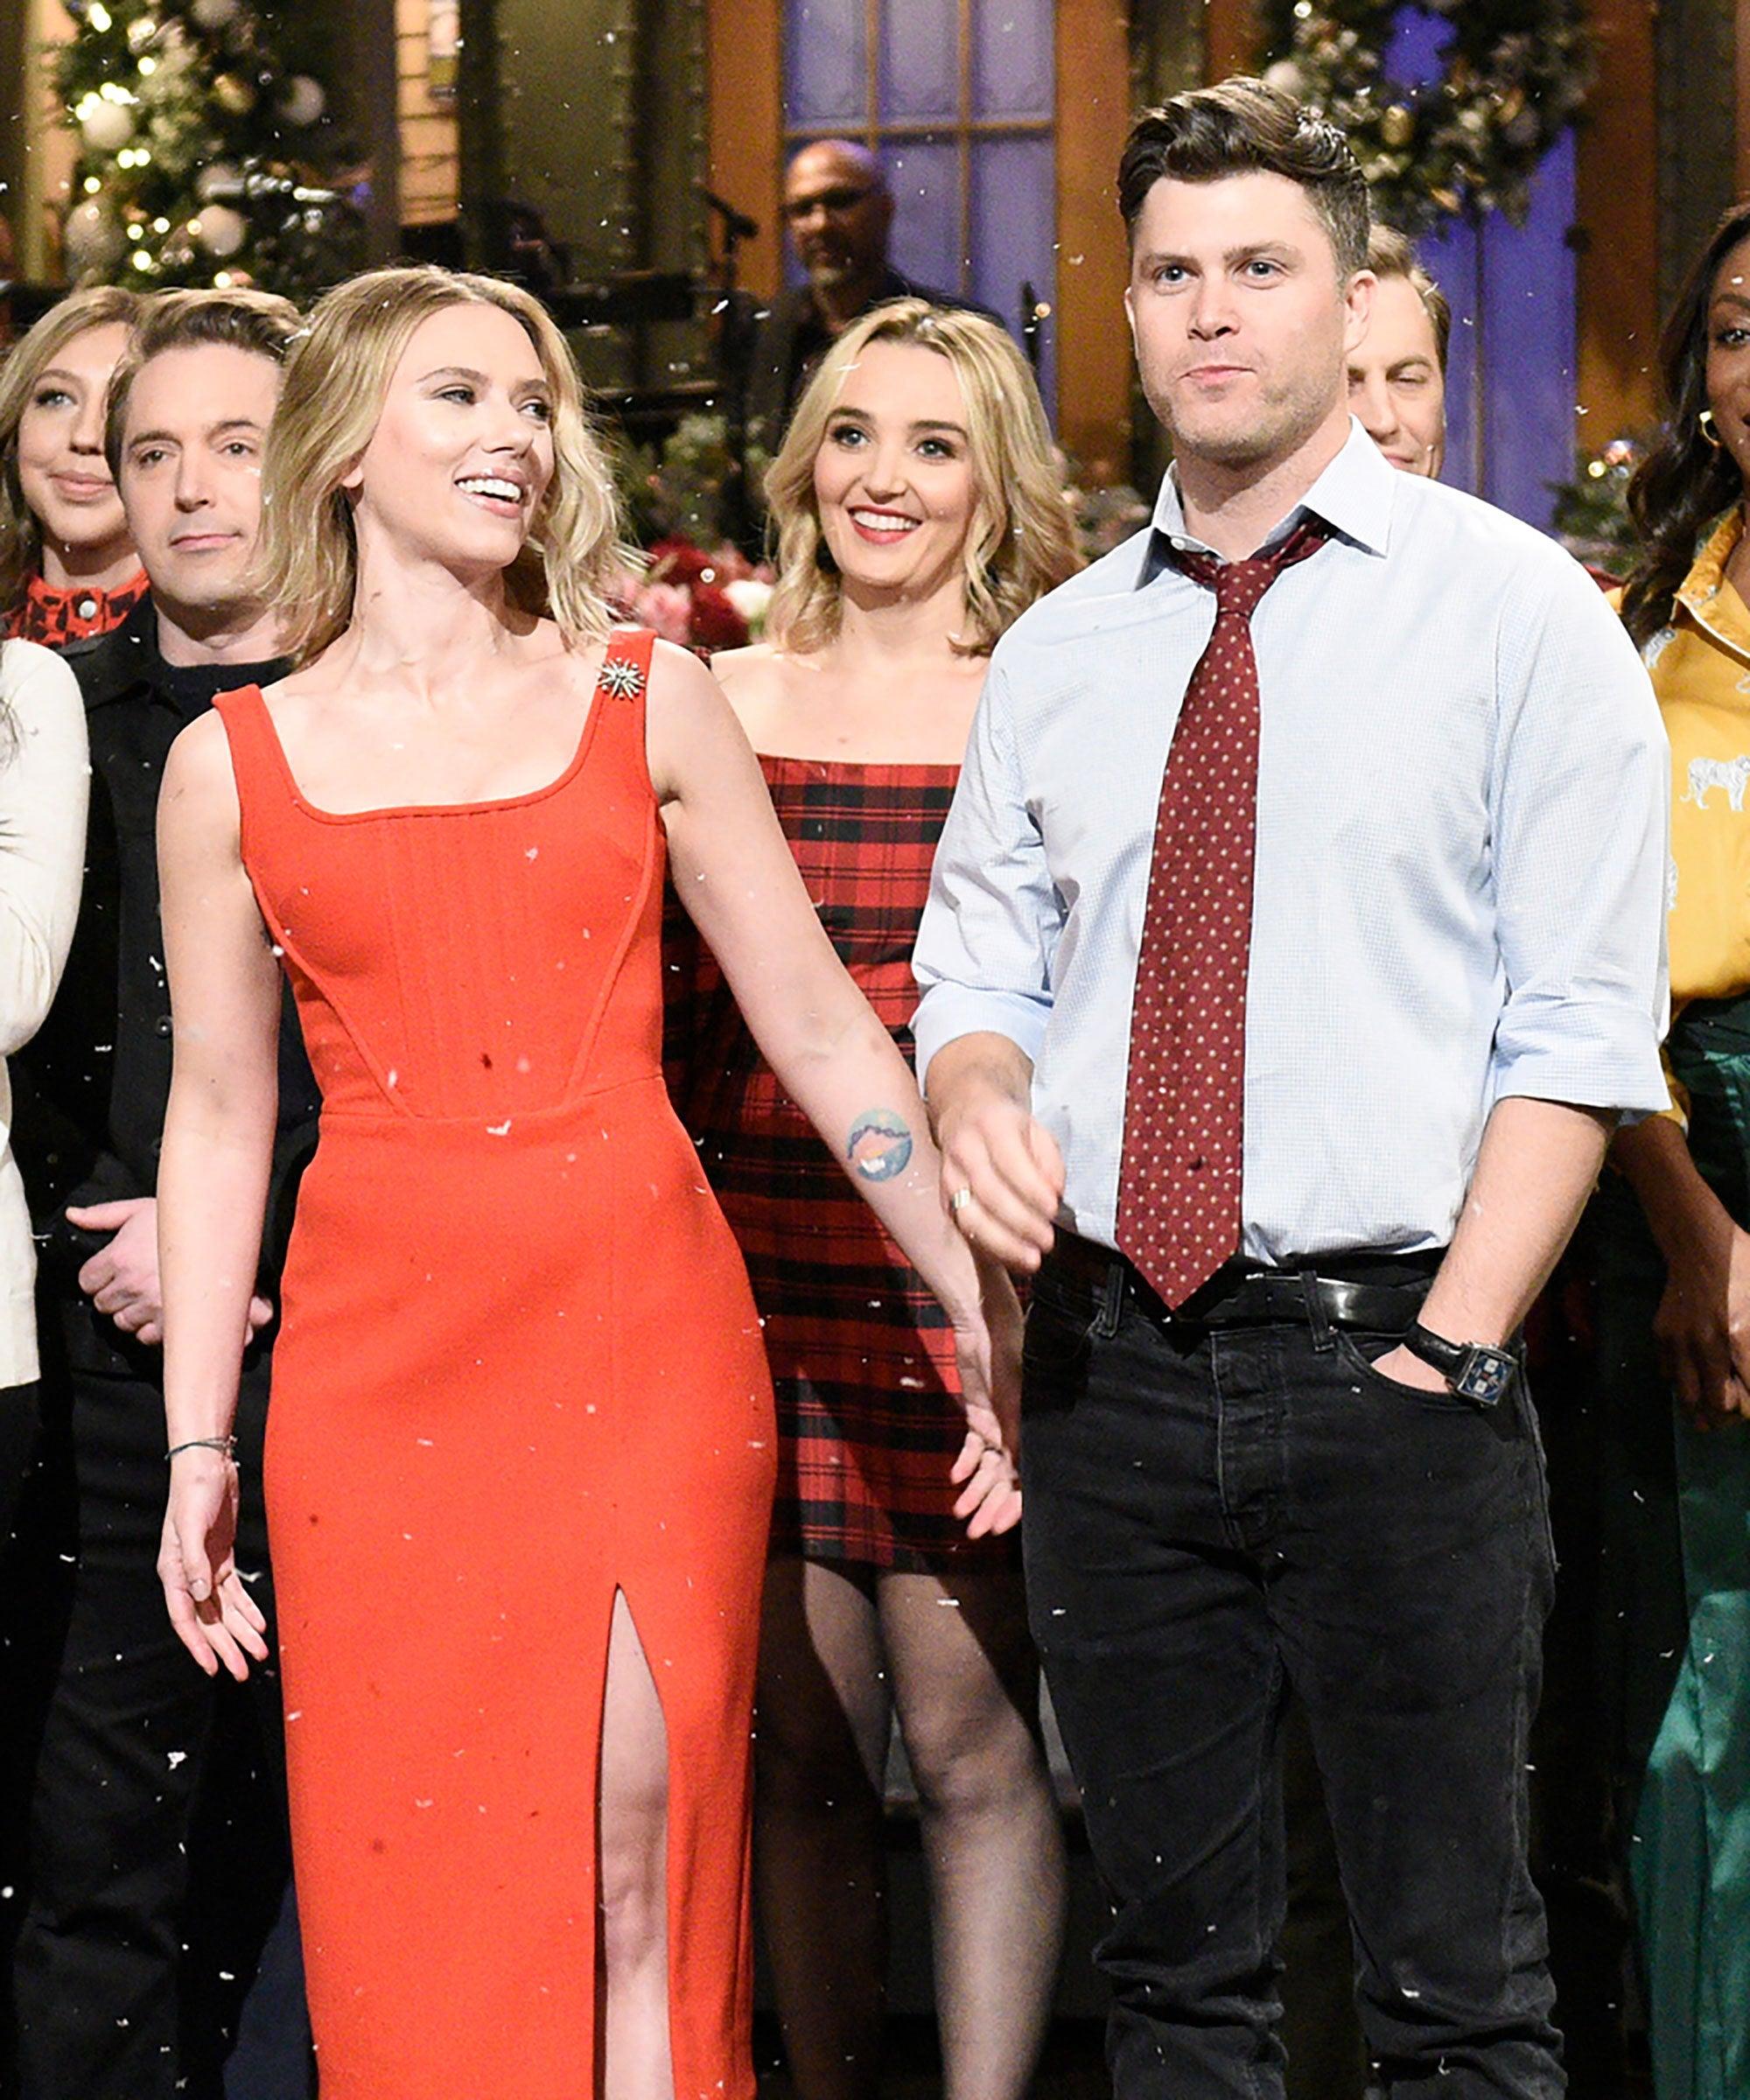 Scarlett Johansson Colin Jost Engaged Kiss On Snl